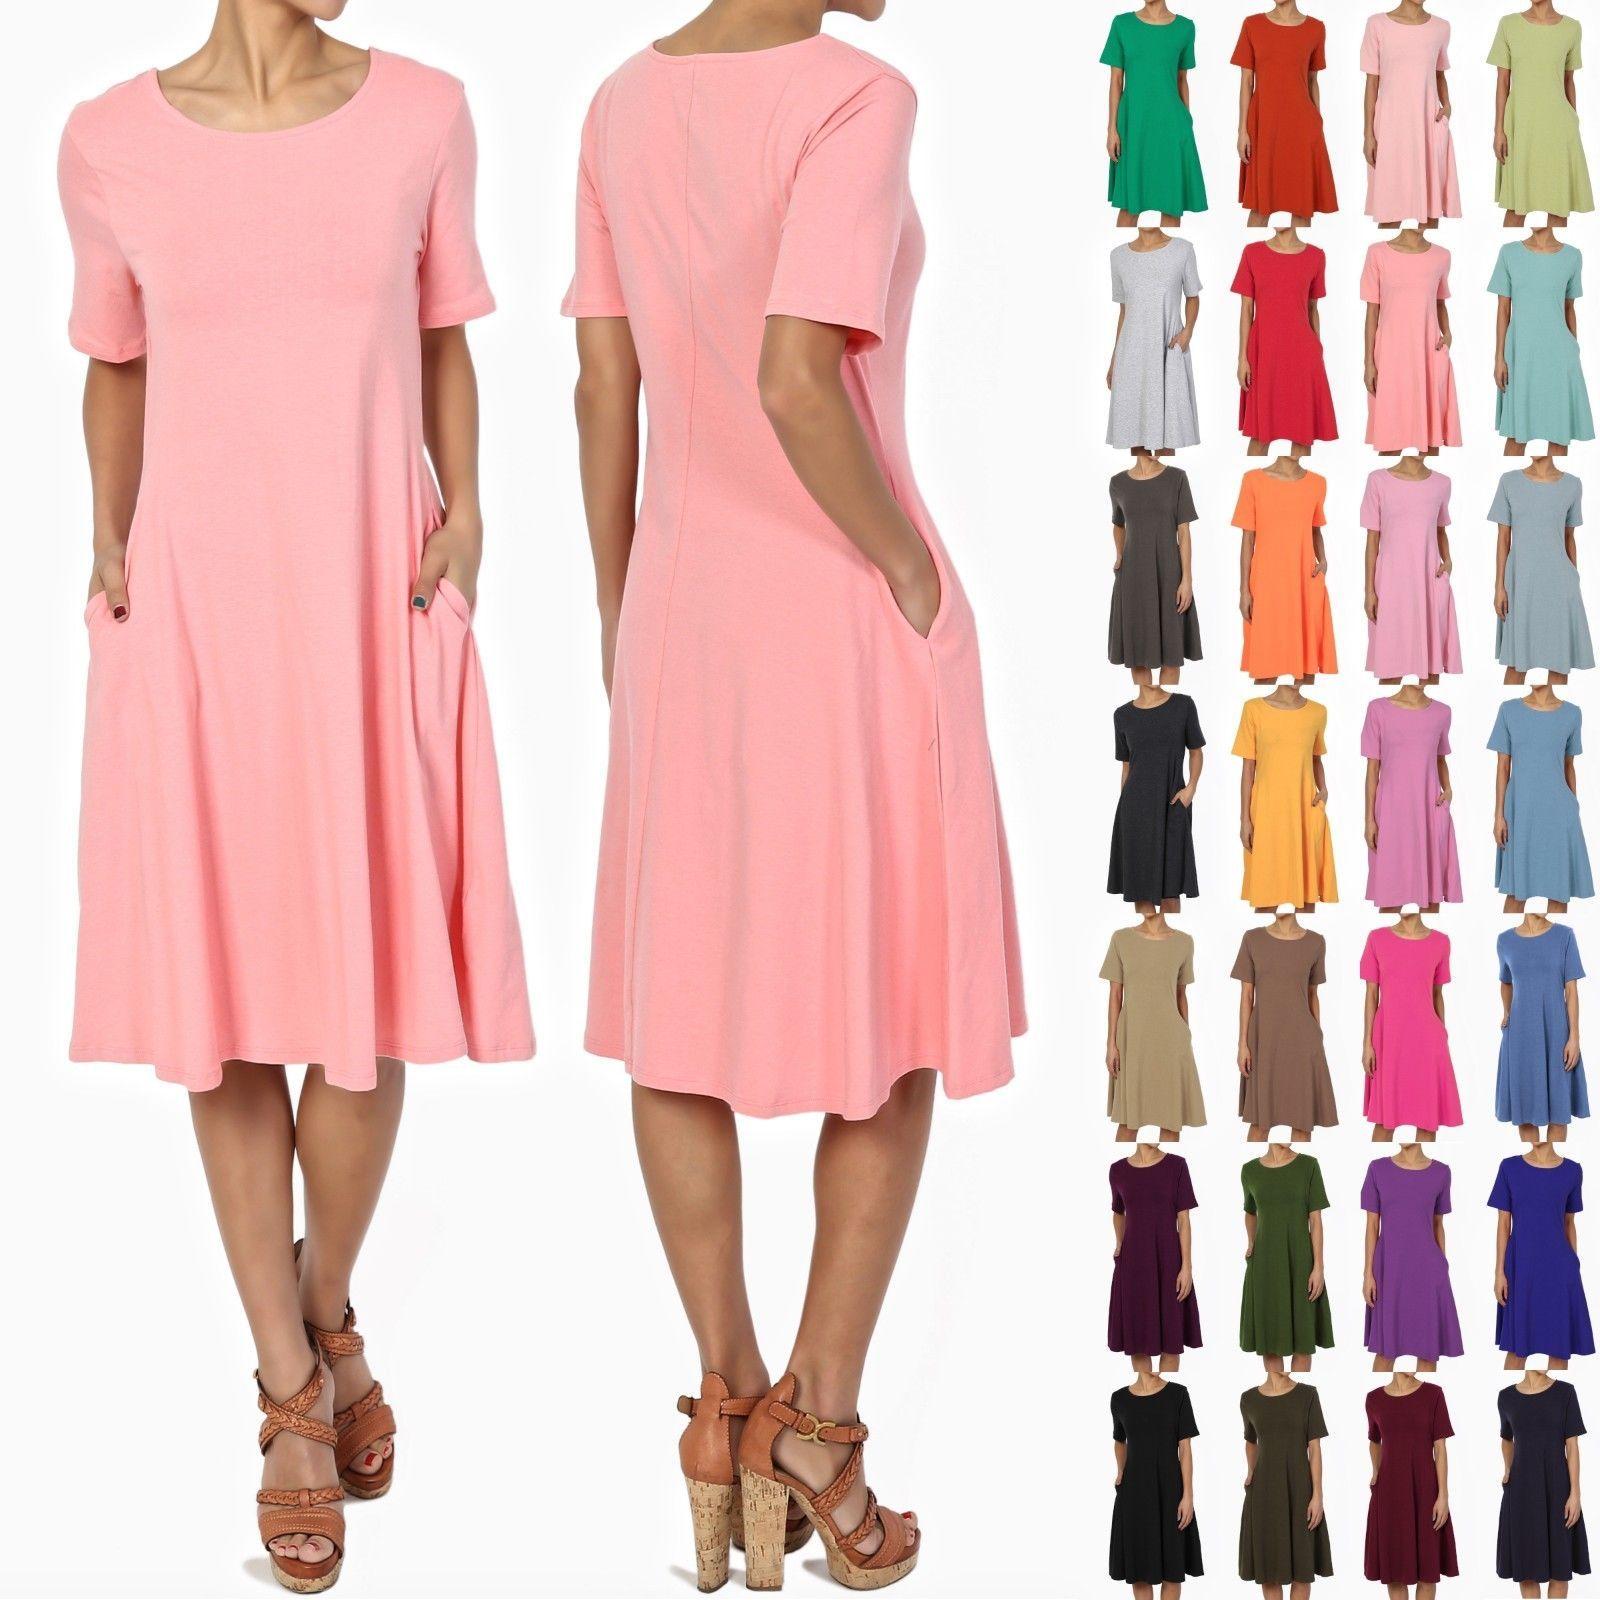 TheMogan SXL Womens Short Sleeve Stretch Cotton Pocket A-line Fit ...